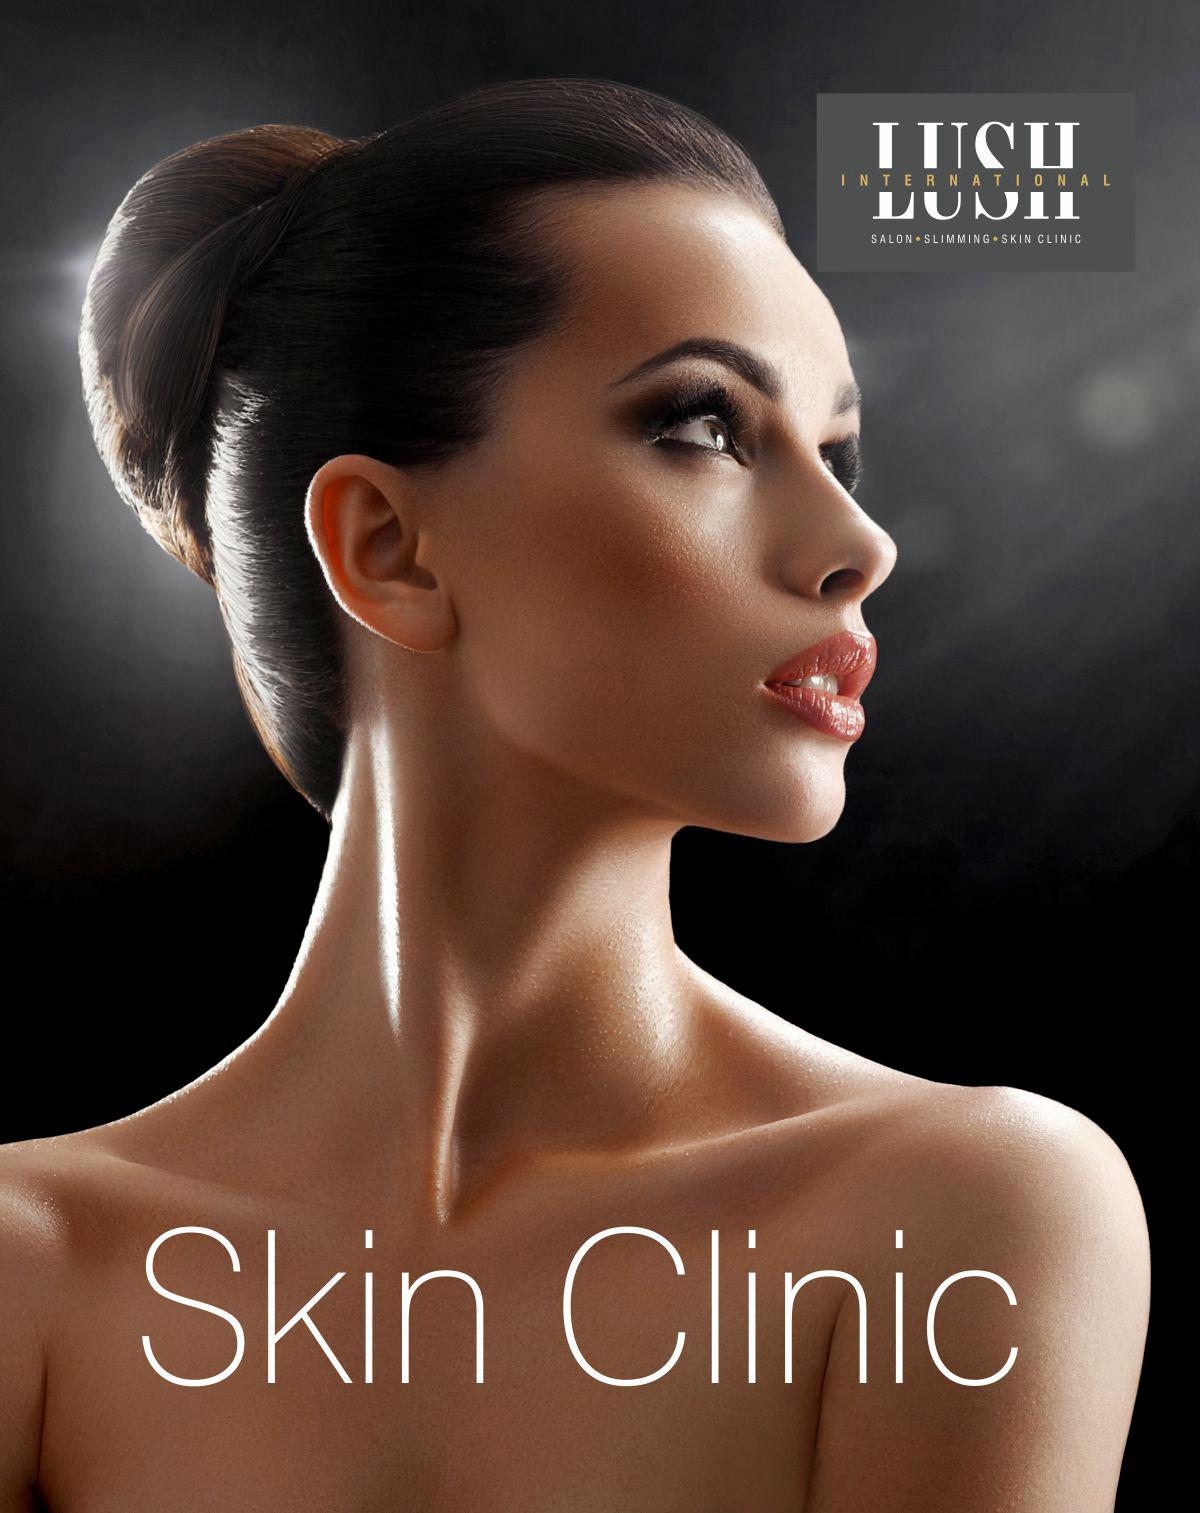 poster design for skin care, salon